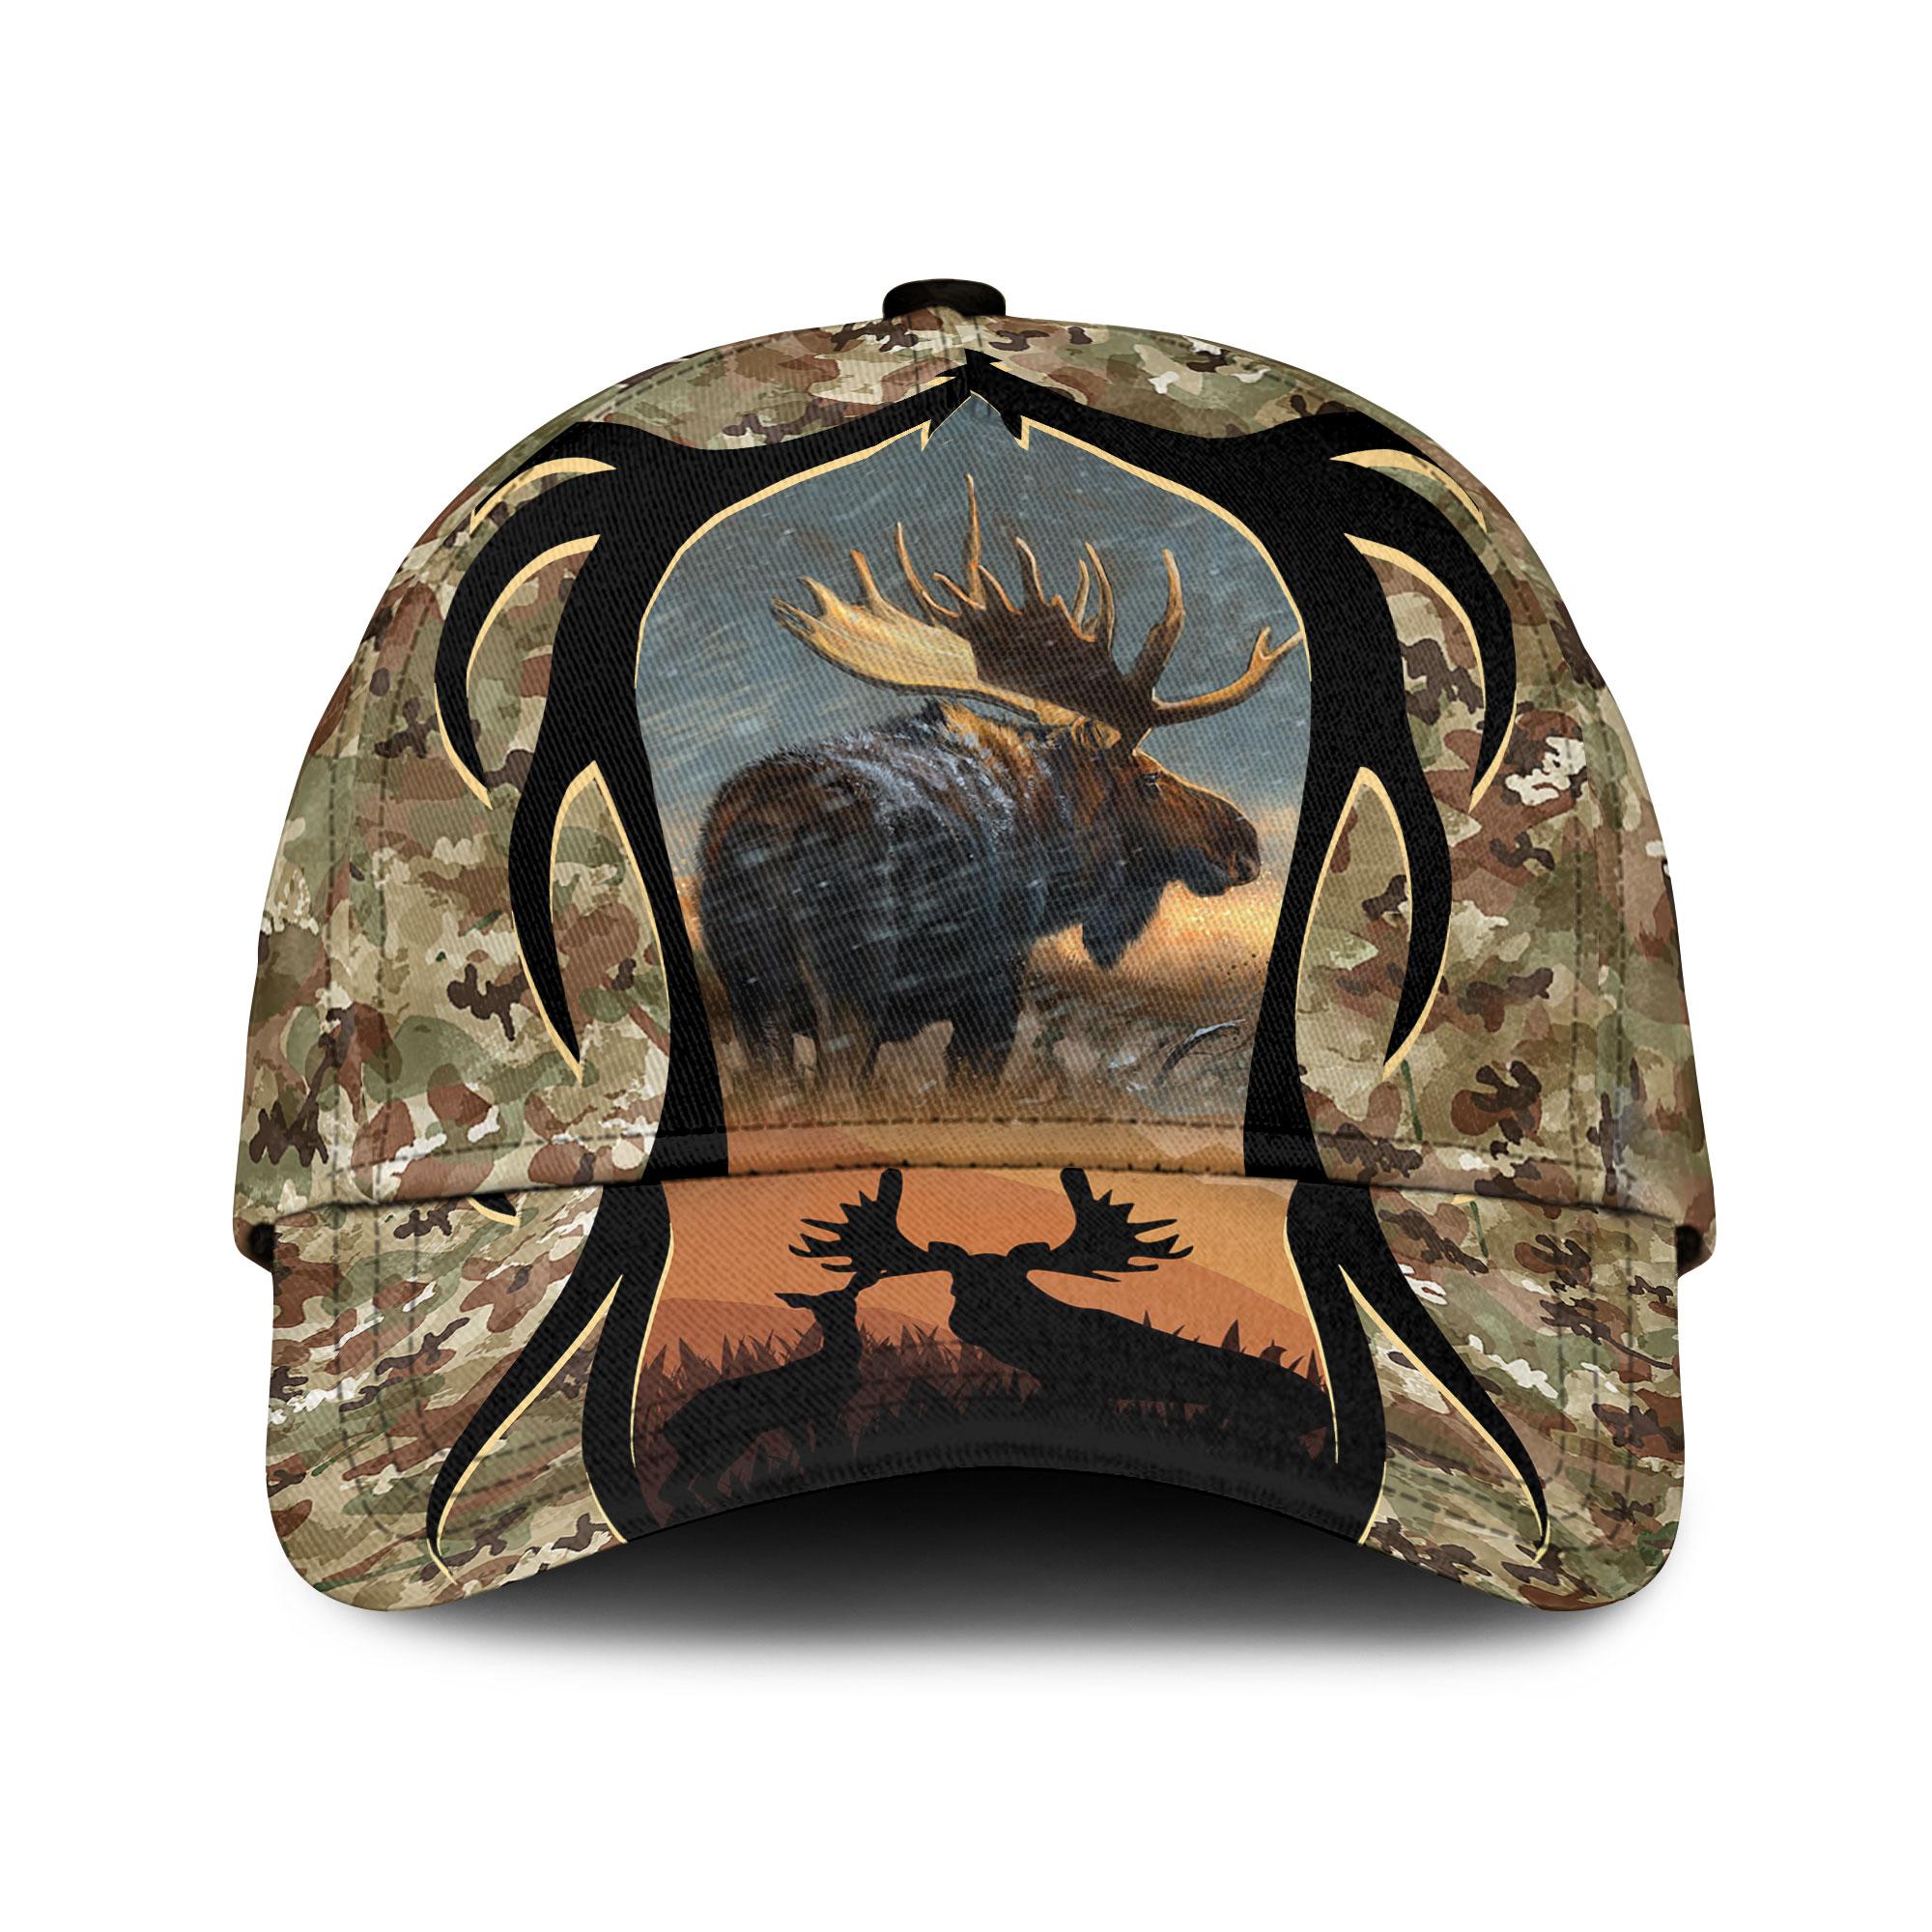 Love Moose Hunting Camouflage Sku 150 Classic Cap